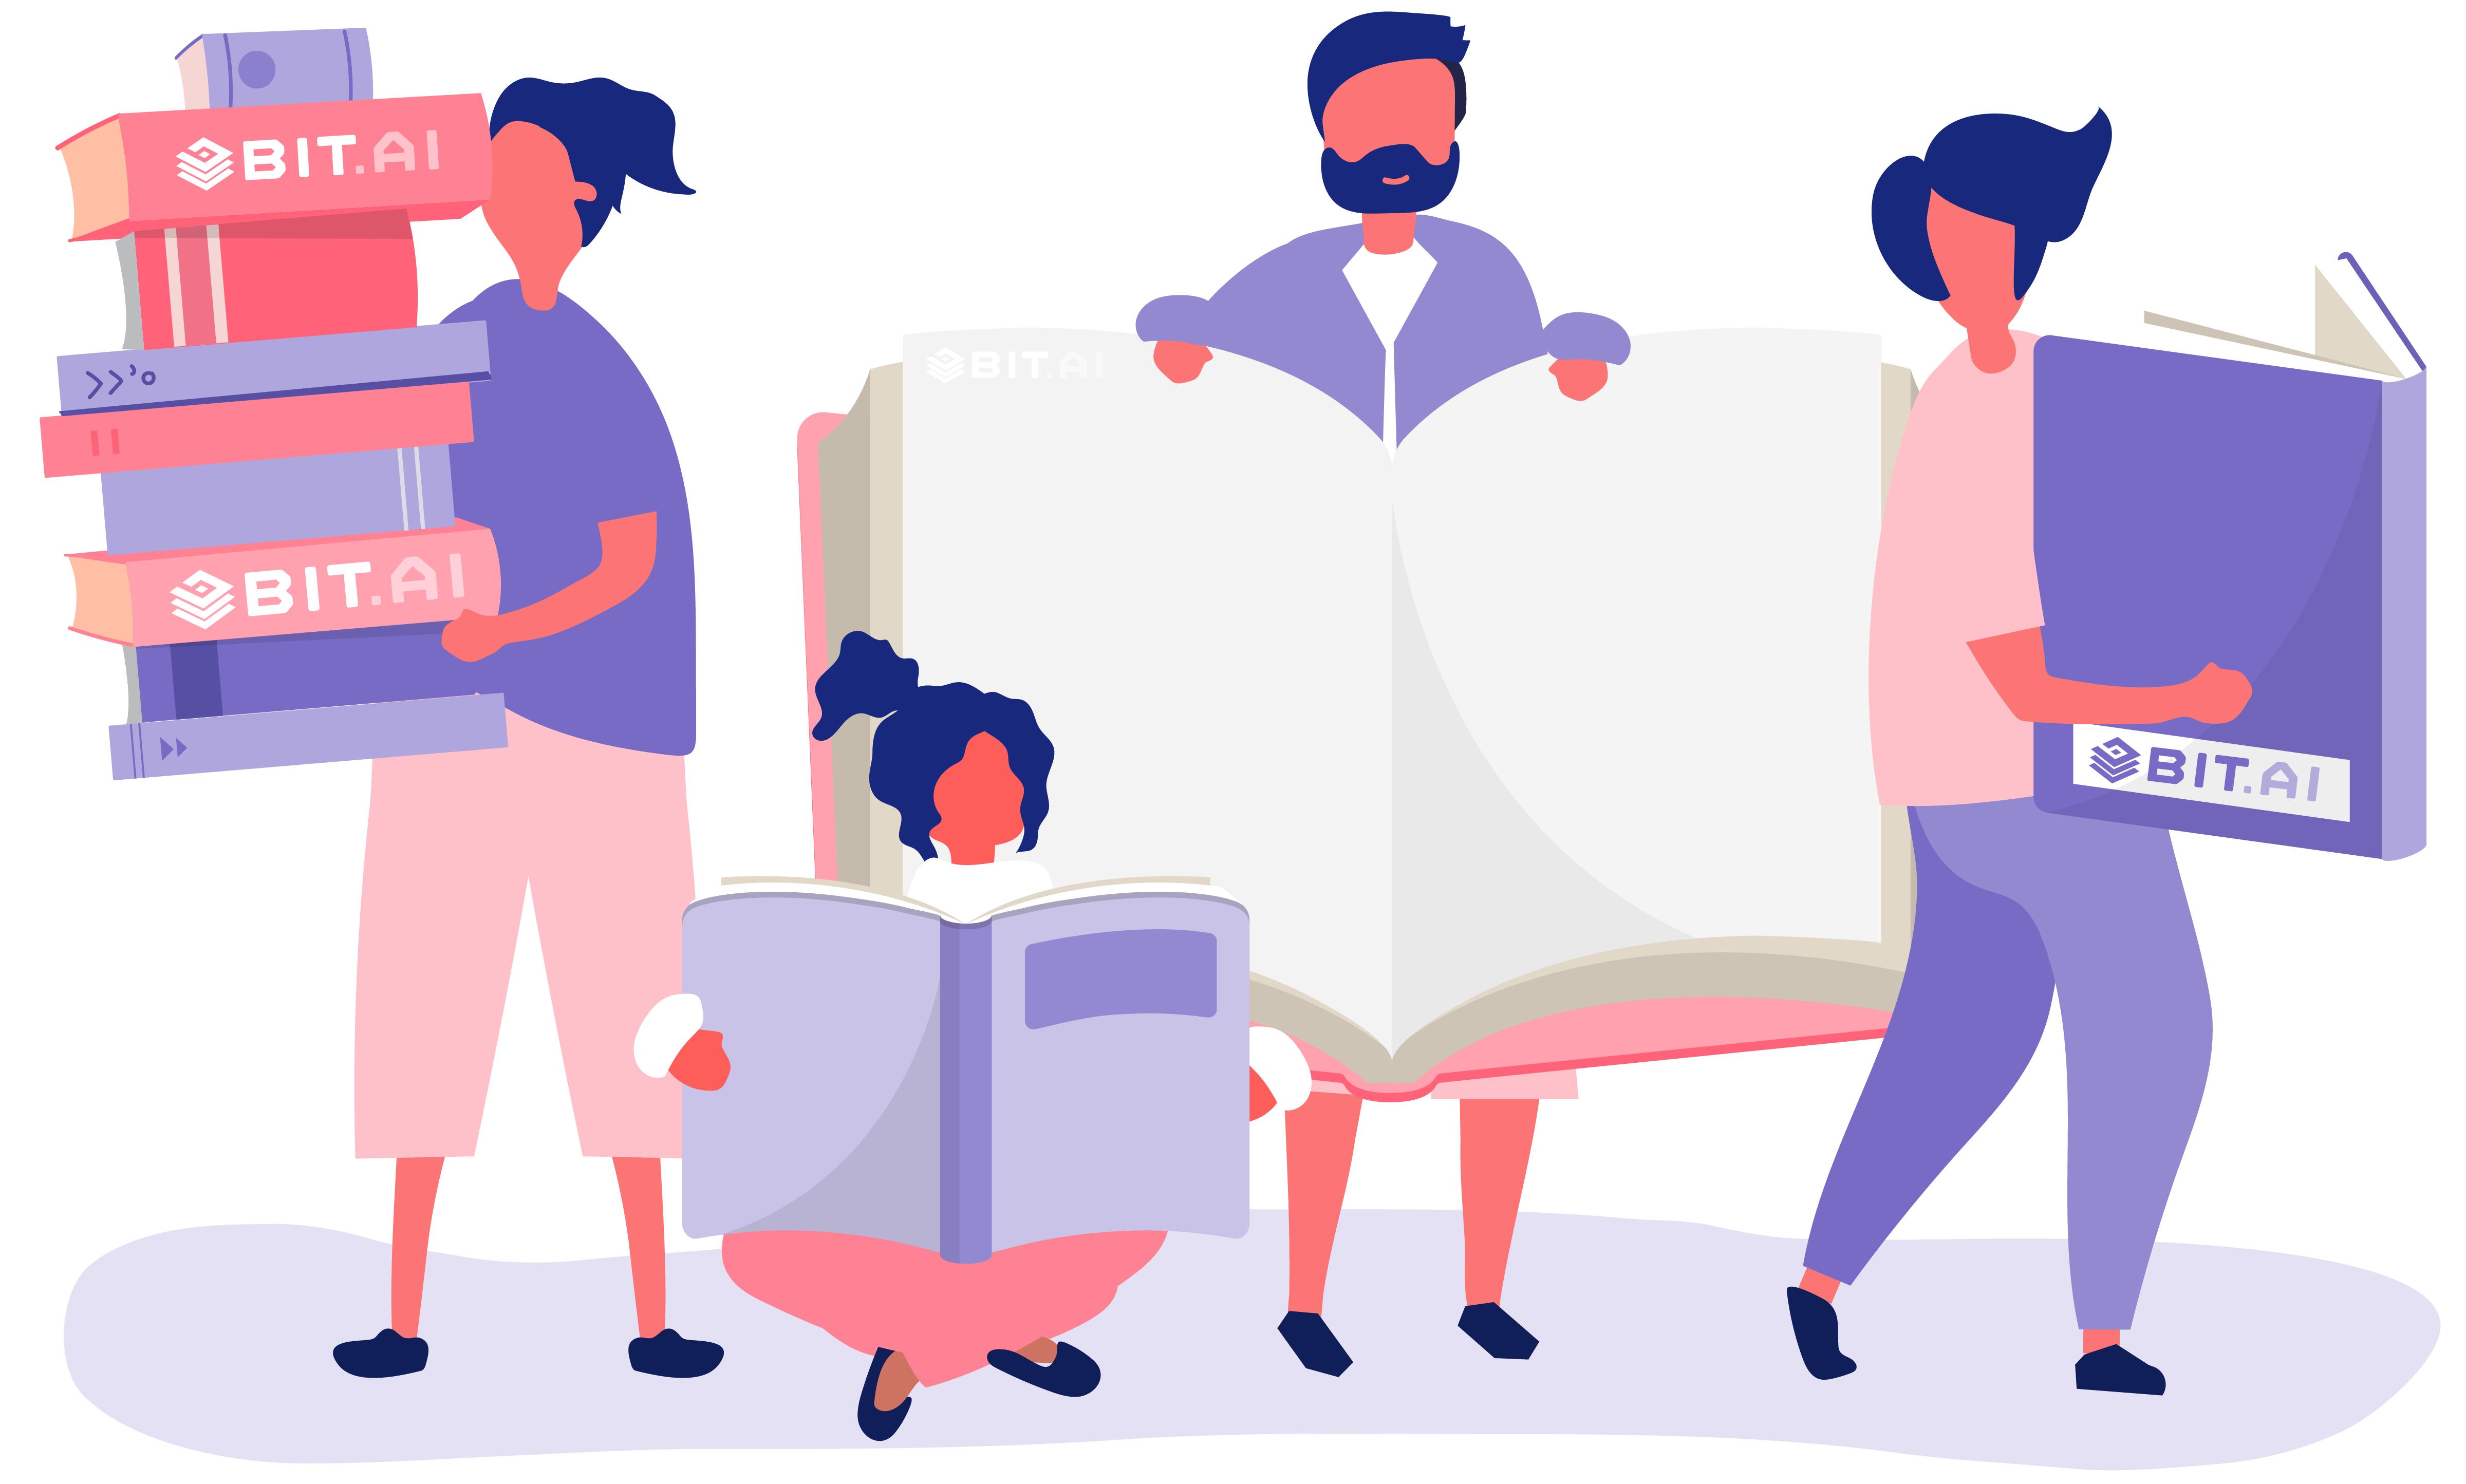 Knowledge books representing internal wiki